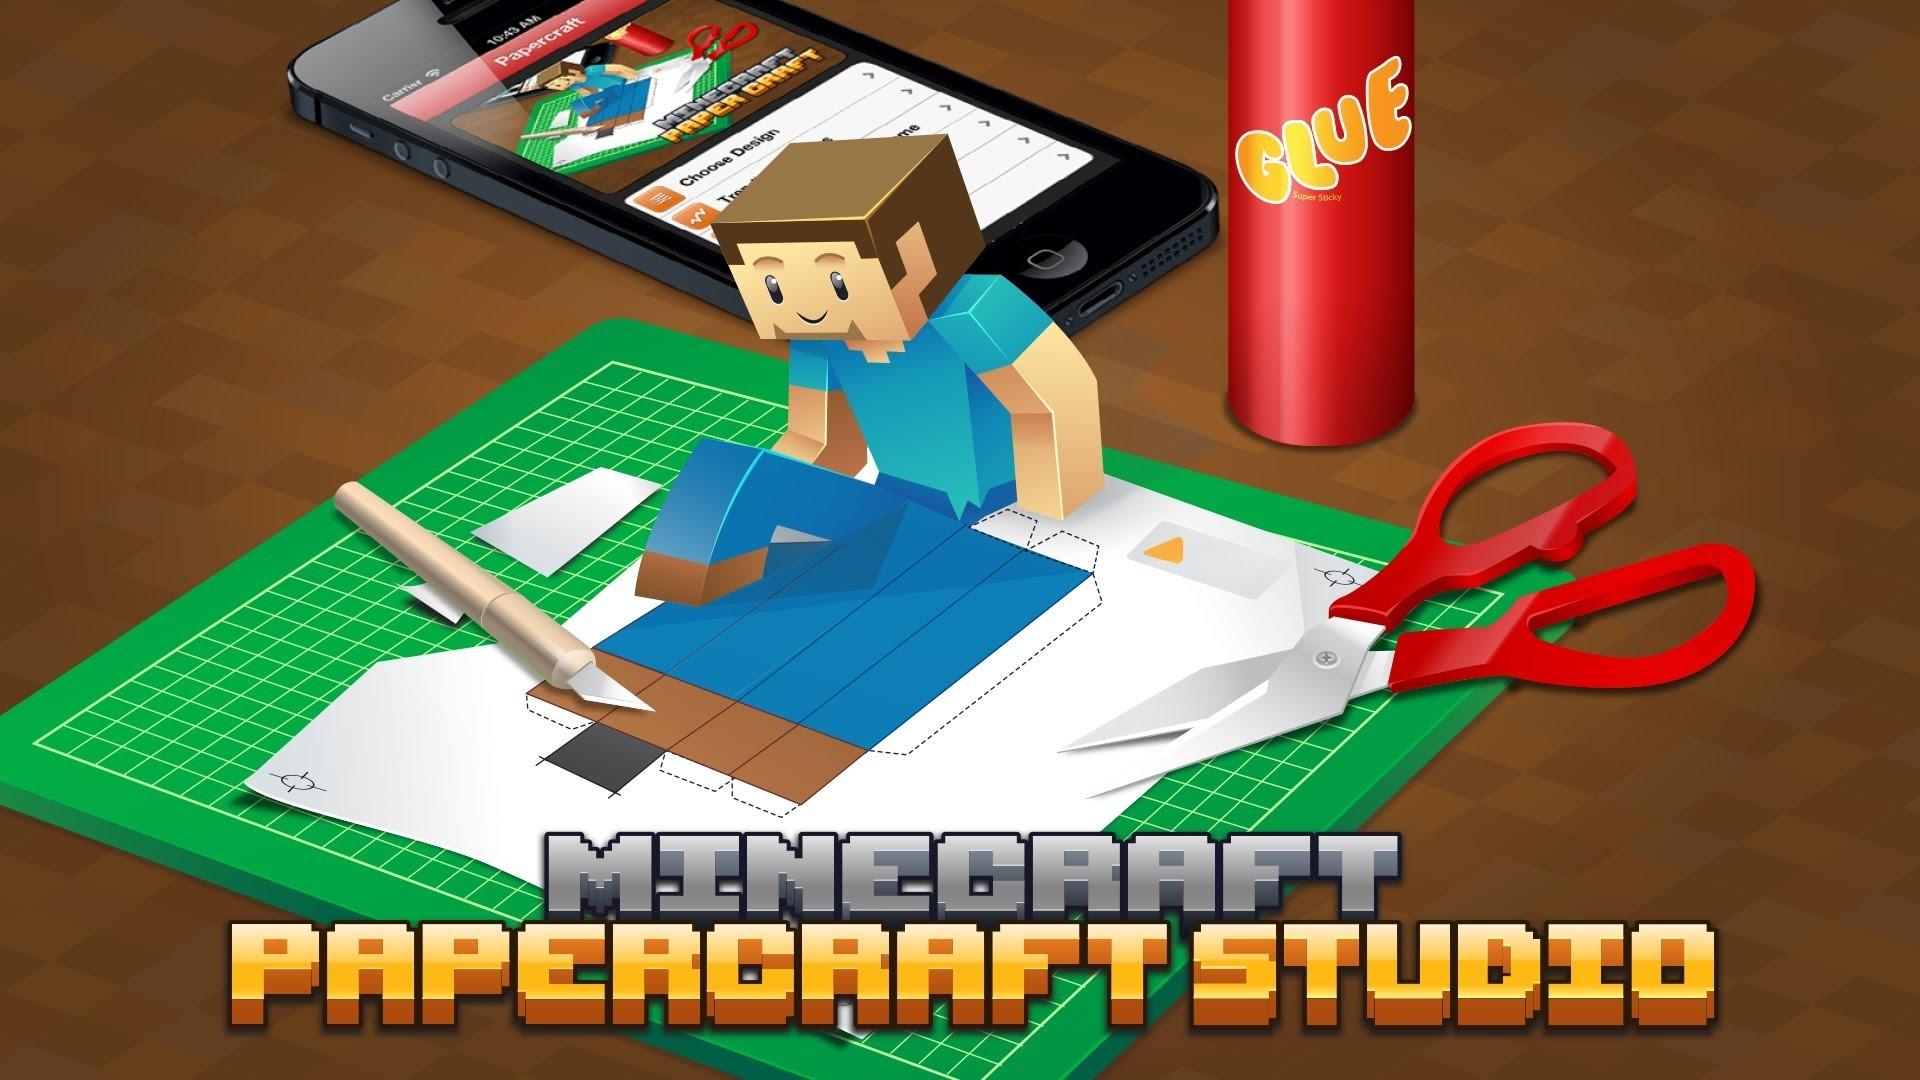 Minecraft Papercraft Studio App Trailer